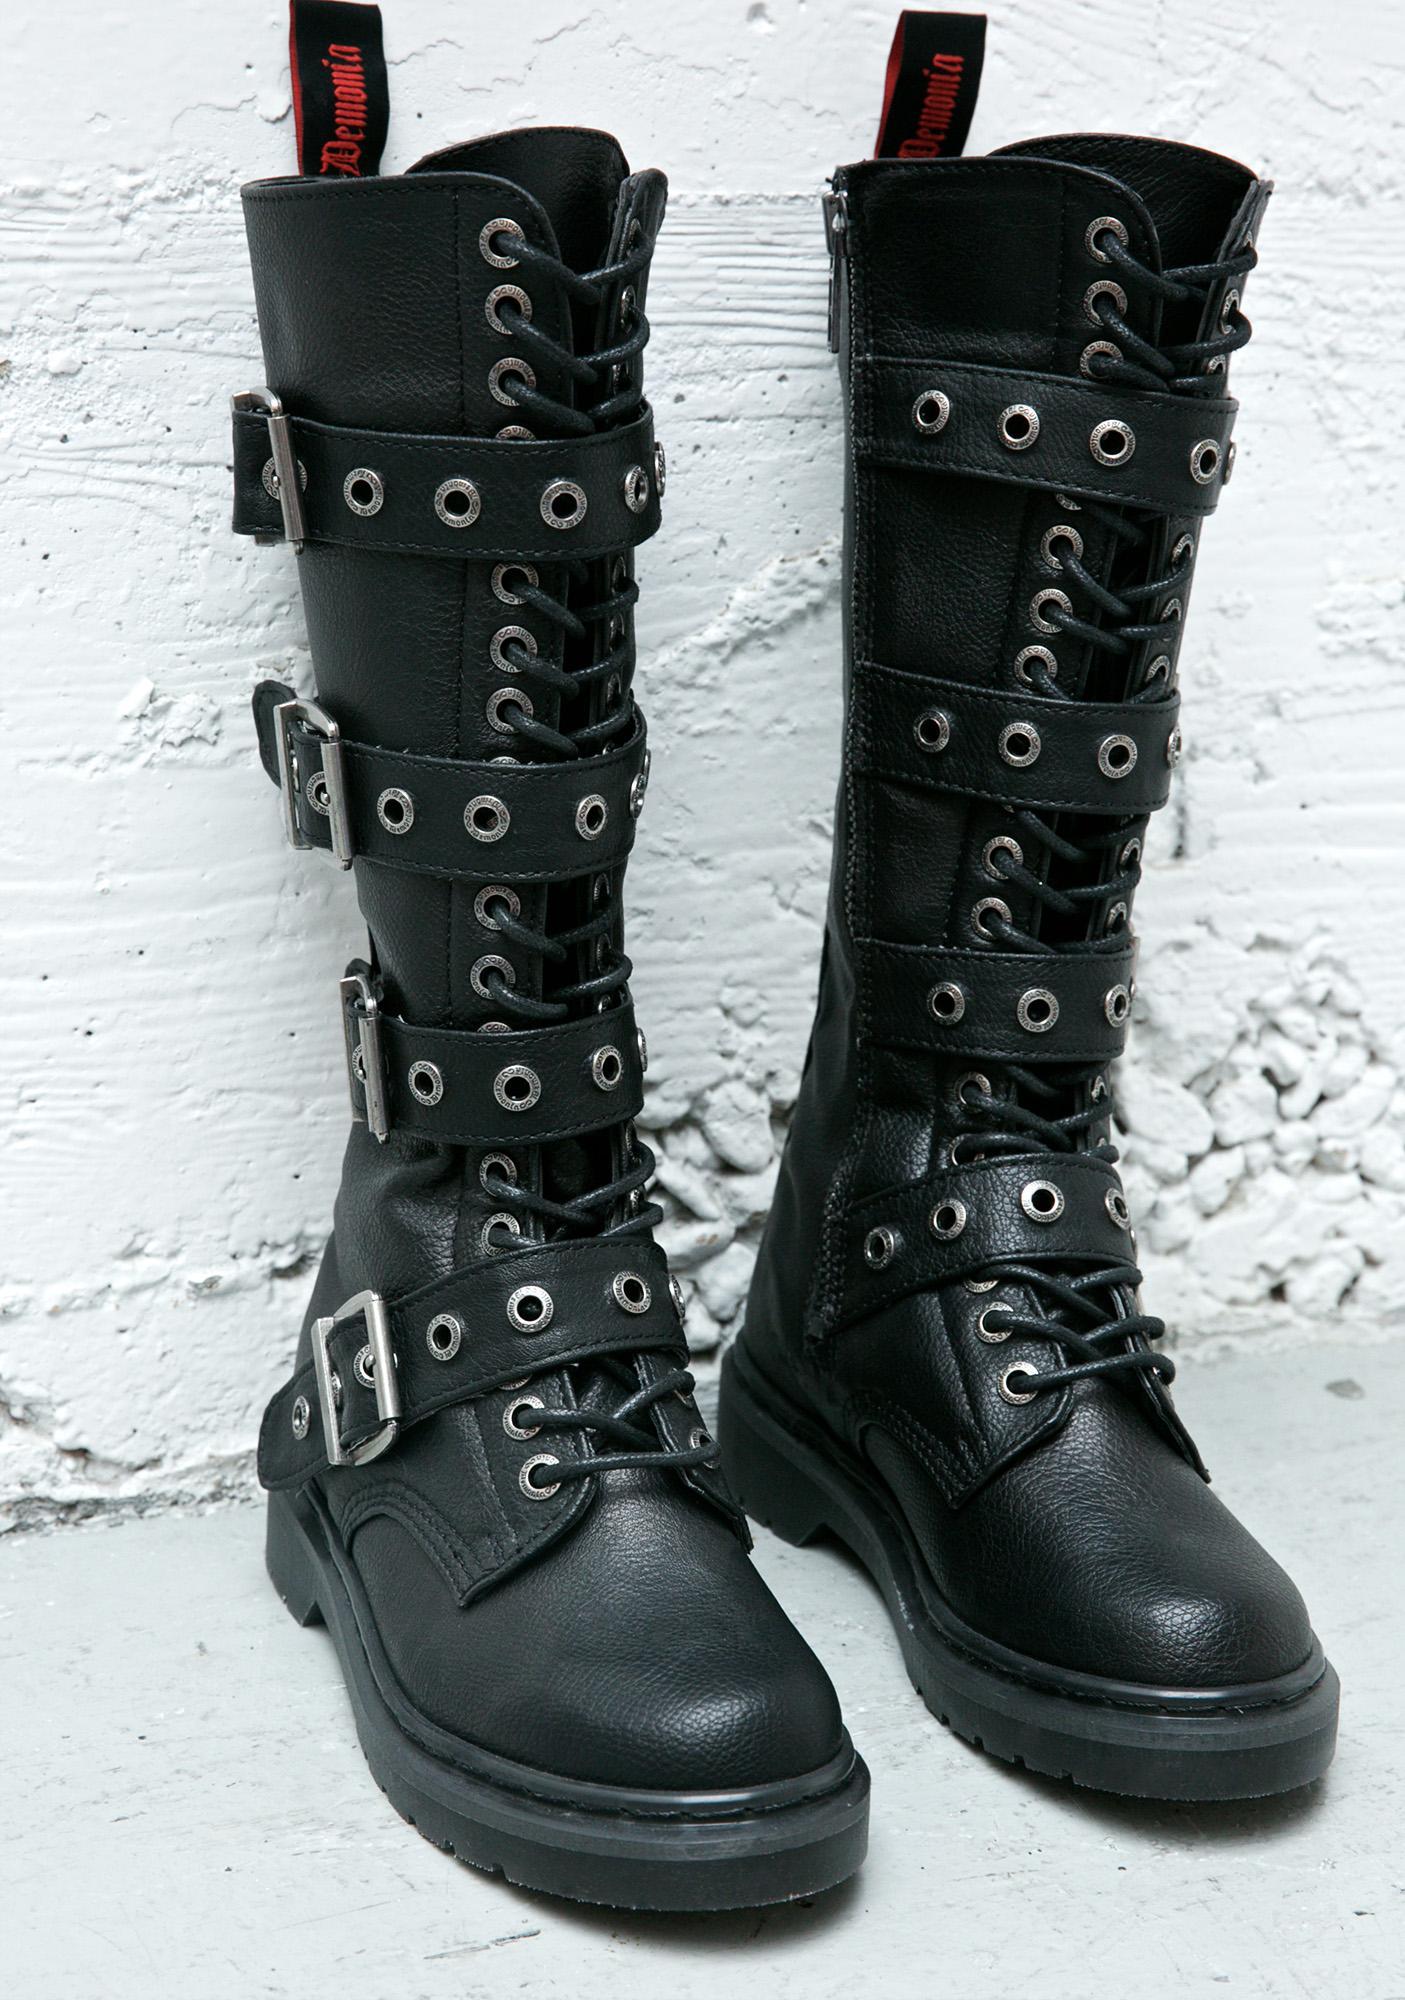 Demonia Fatality Tall Combat Boots